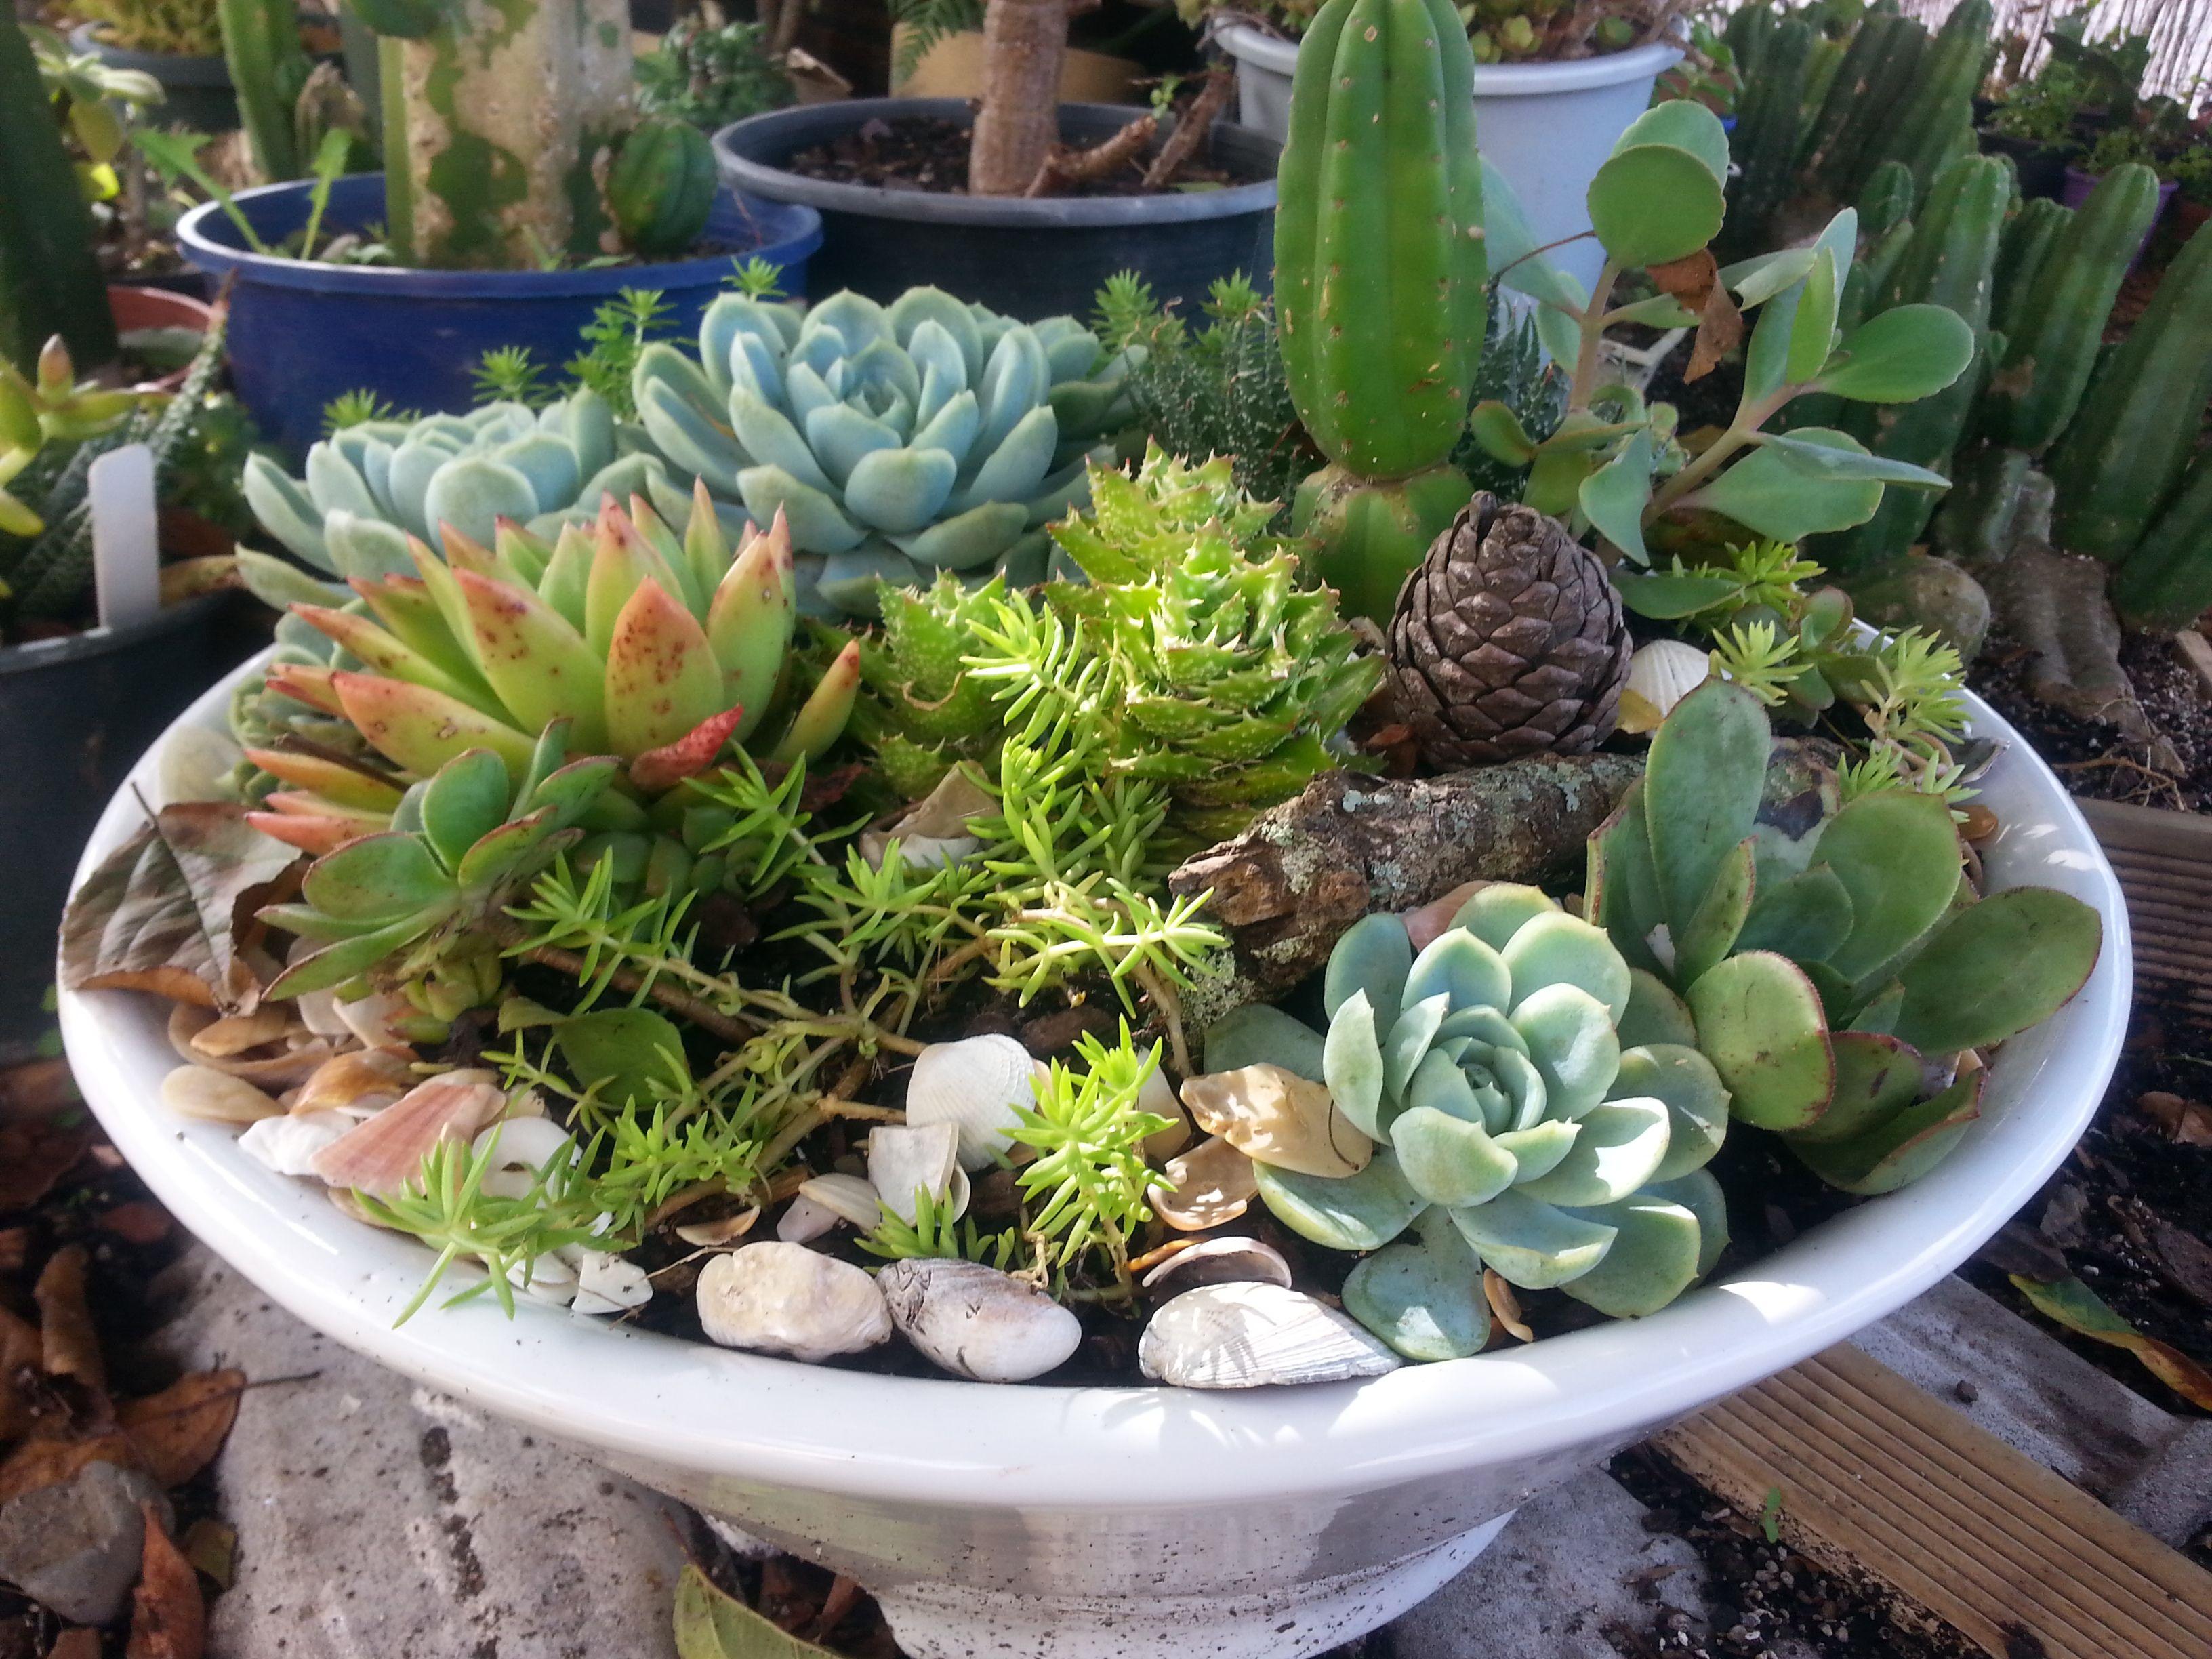 A succulent garden in a repurposed old ceramic bathroom for Succulent dish garden designs